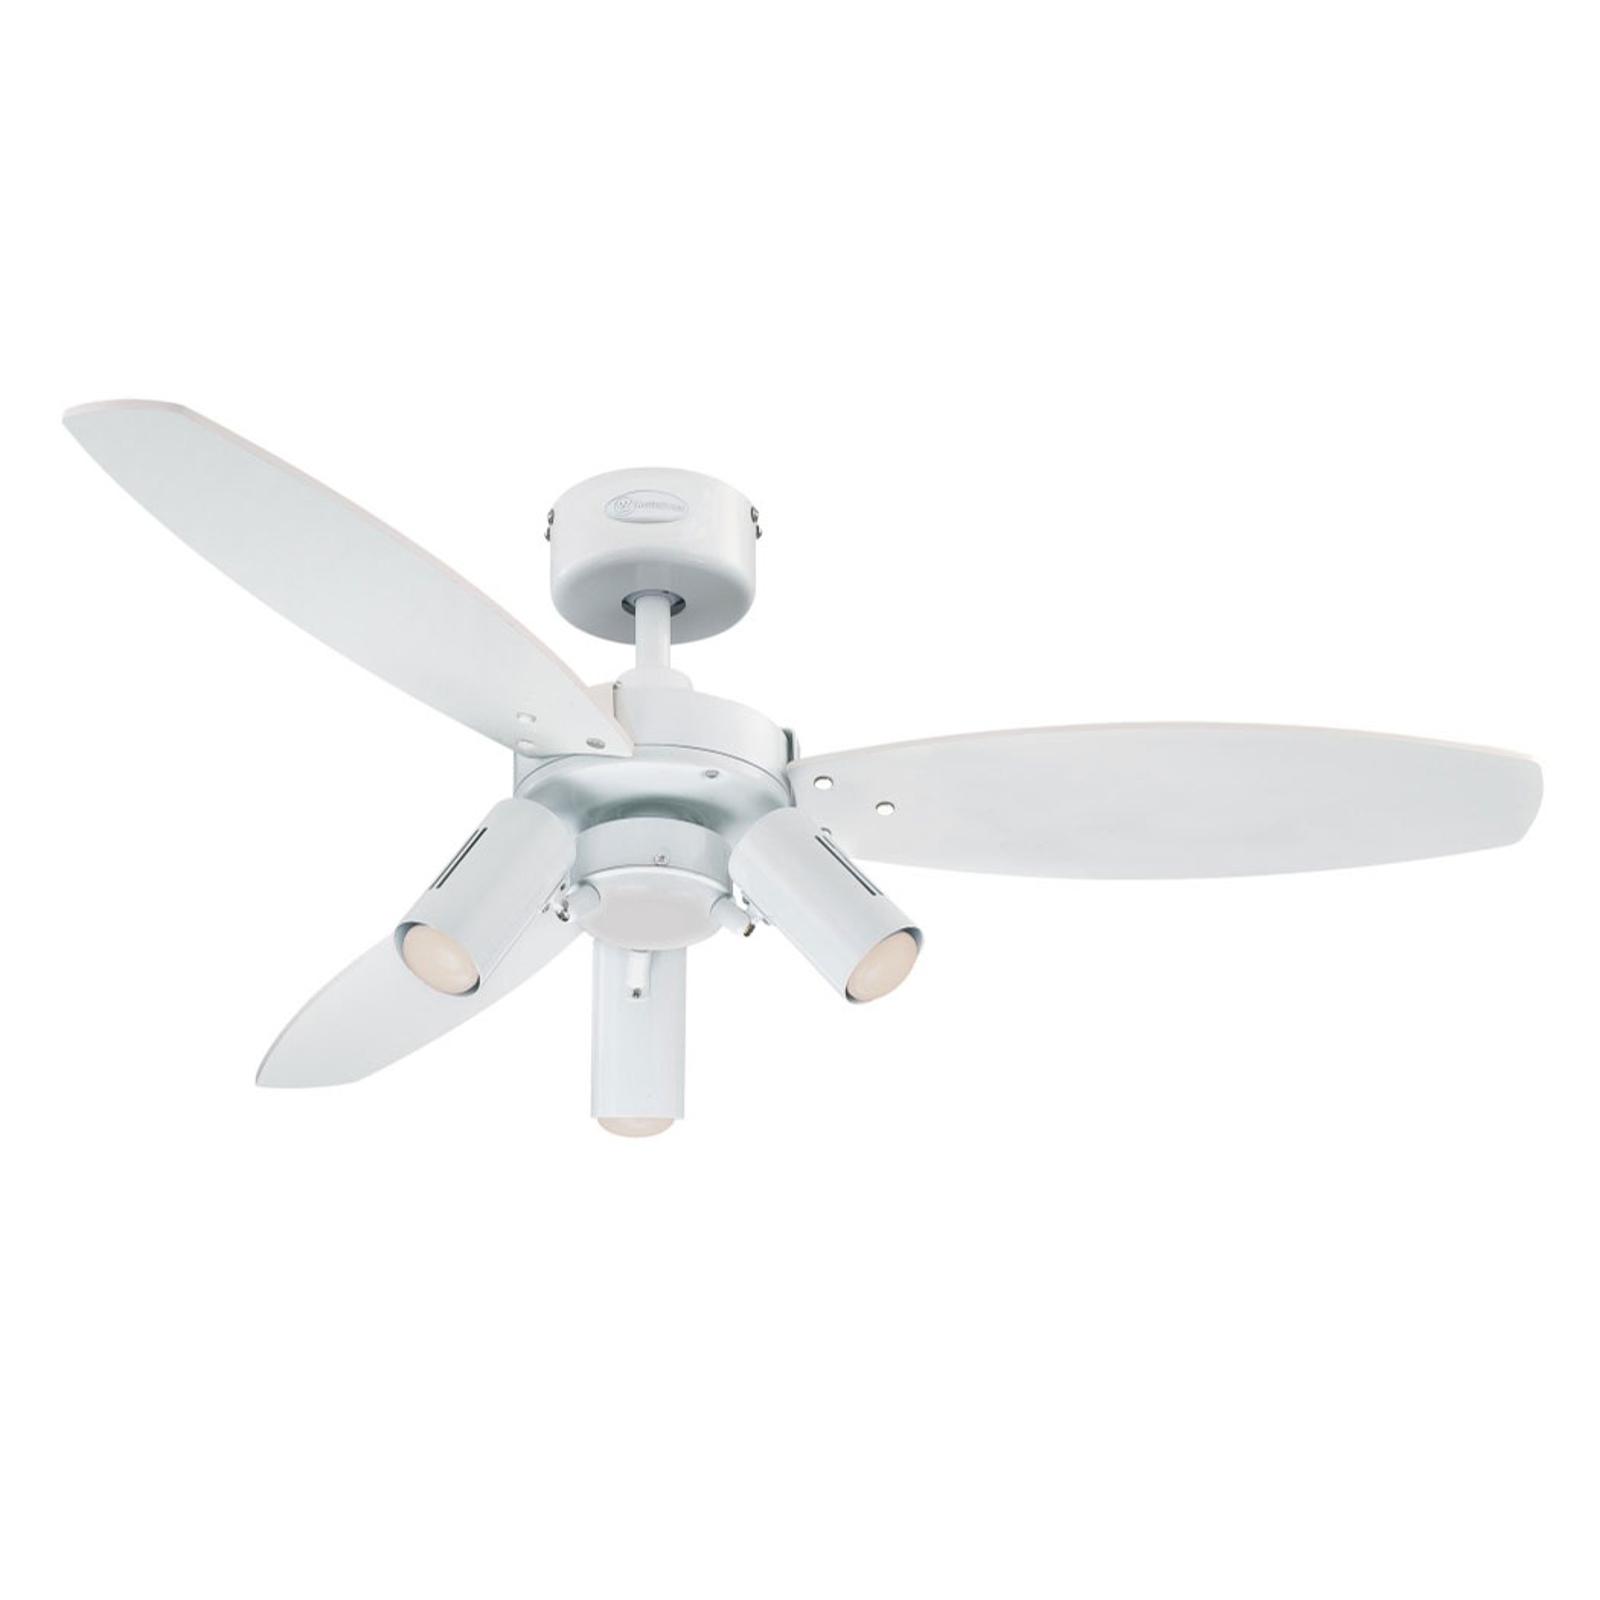 Westinghouse Jet Plus Ventilator m. Licht 3-flg.